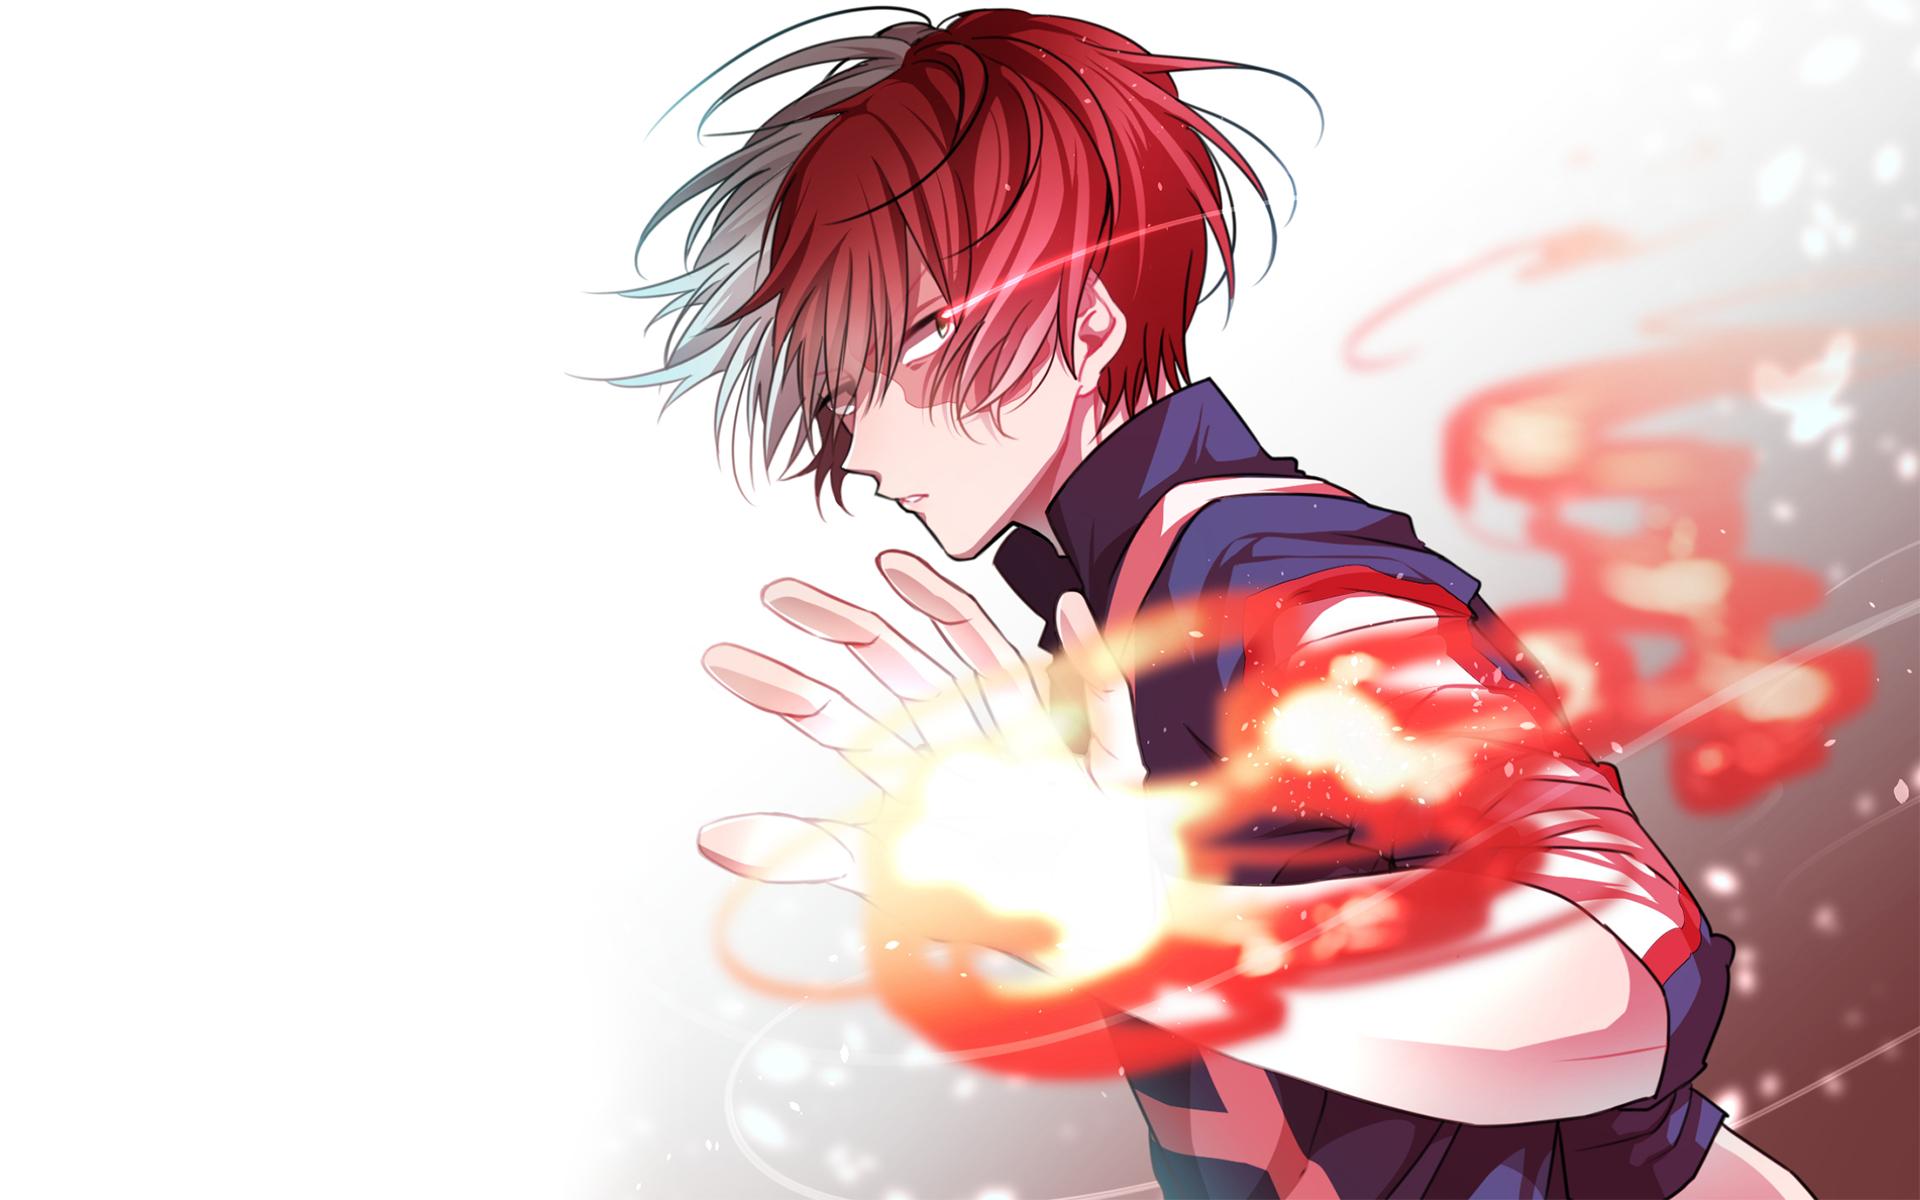 Anime My Hero Academia Shouto Todoroki Wallpaper My Hero